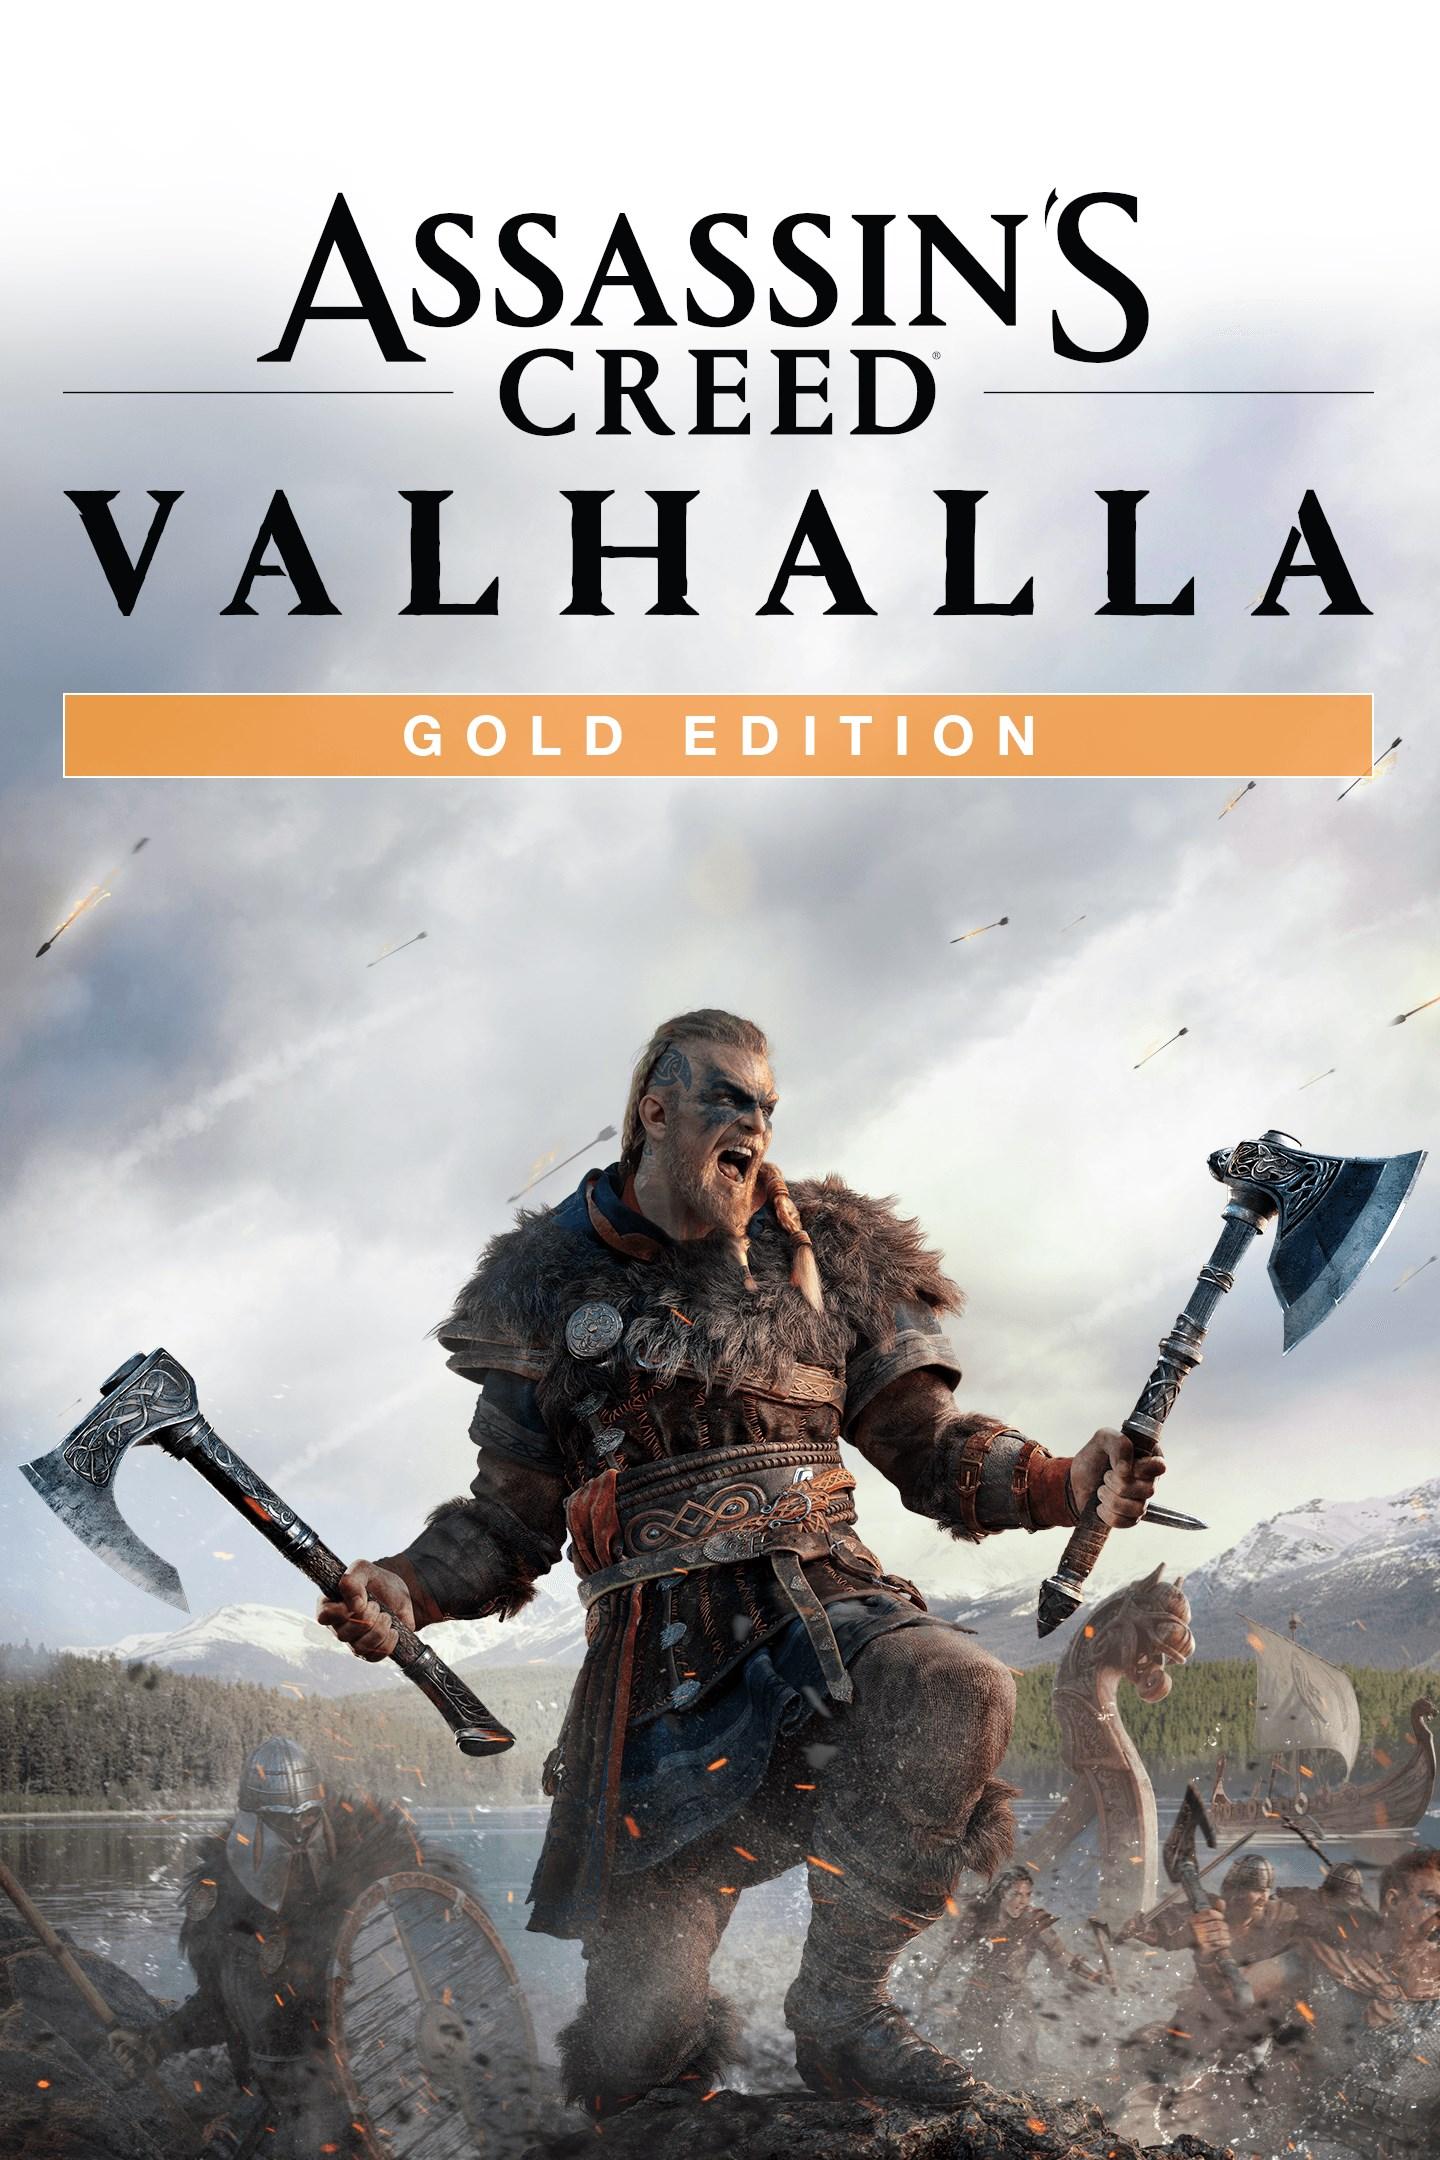 Assassin's Creed Valhalla Gold Edition box shot